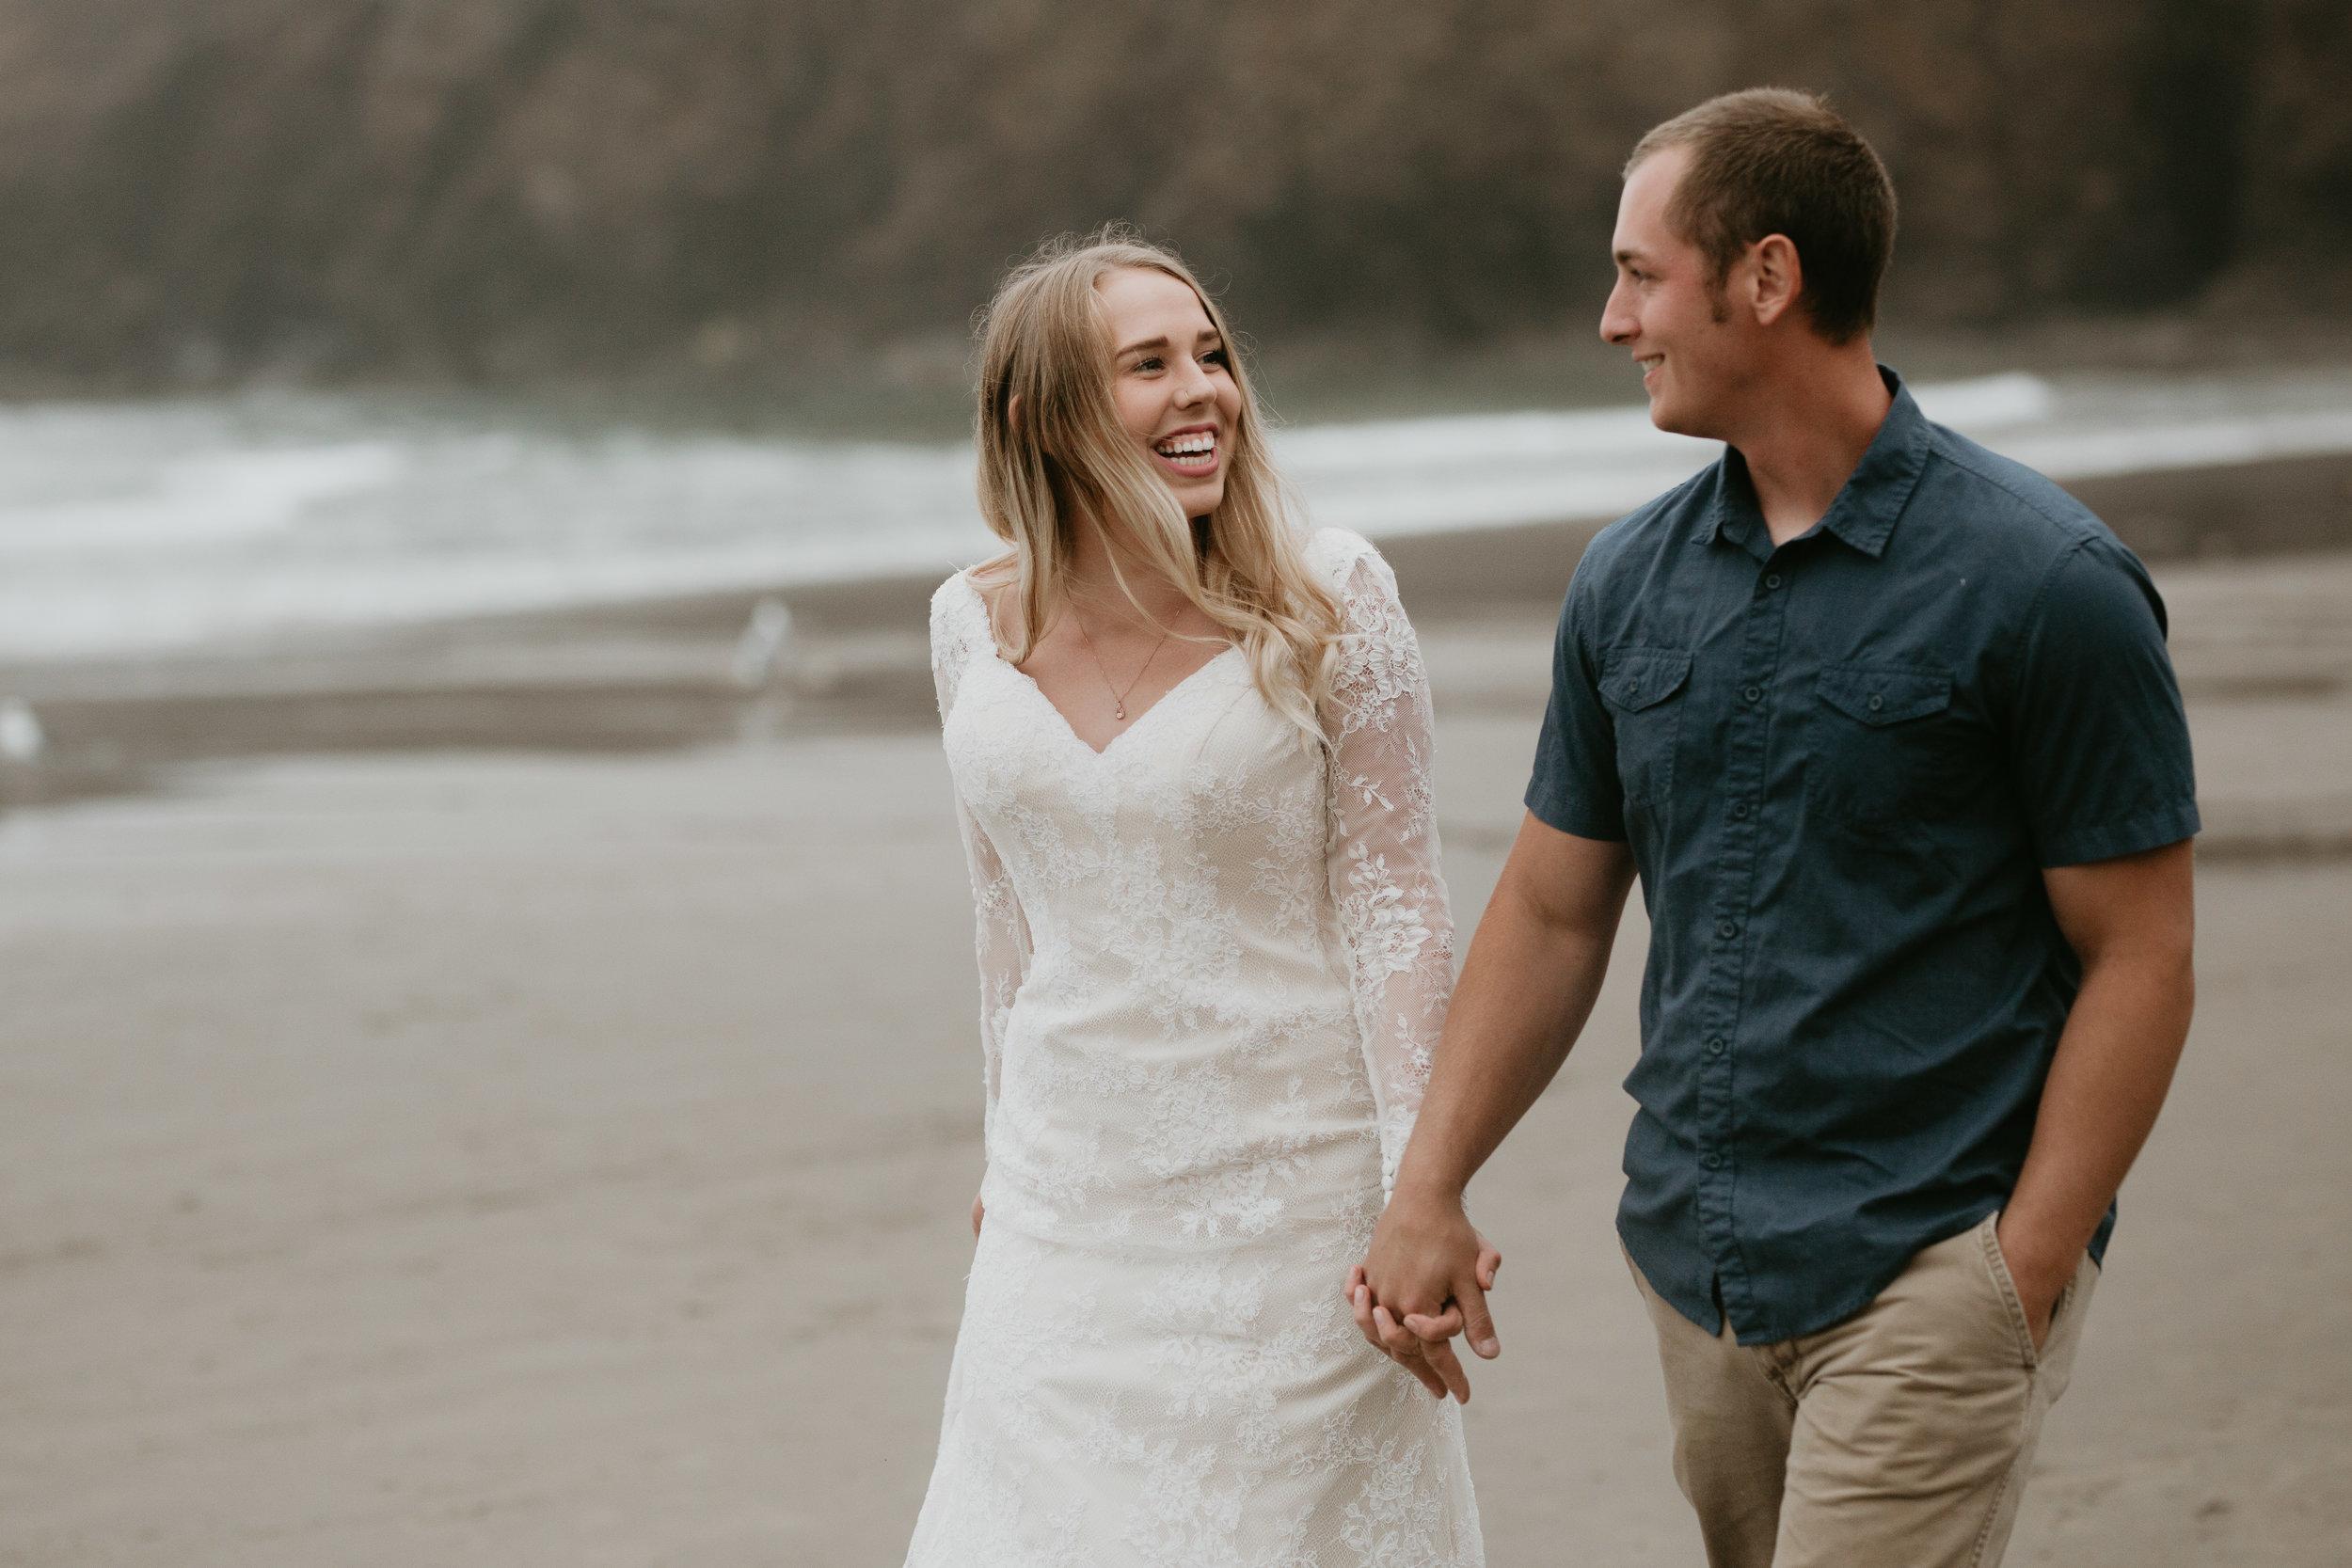 nicole-daacke-photography-ecola-state-park-oregon-elopement-bridal-photos-photographer-for-cannon-beach-elopement-oregon-coast-elopement-photographer-foggy-summer-elopement-cannon-beach-best-adventure-elopement-photographer-5588.jpg